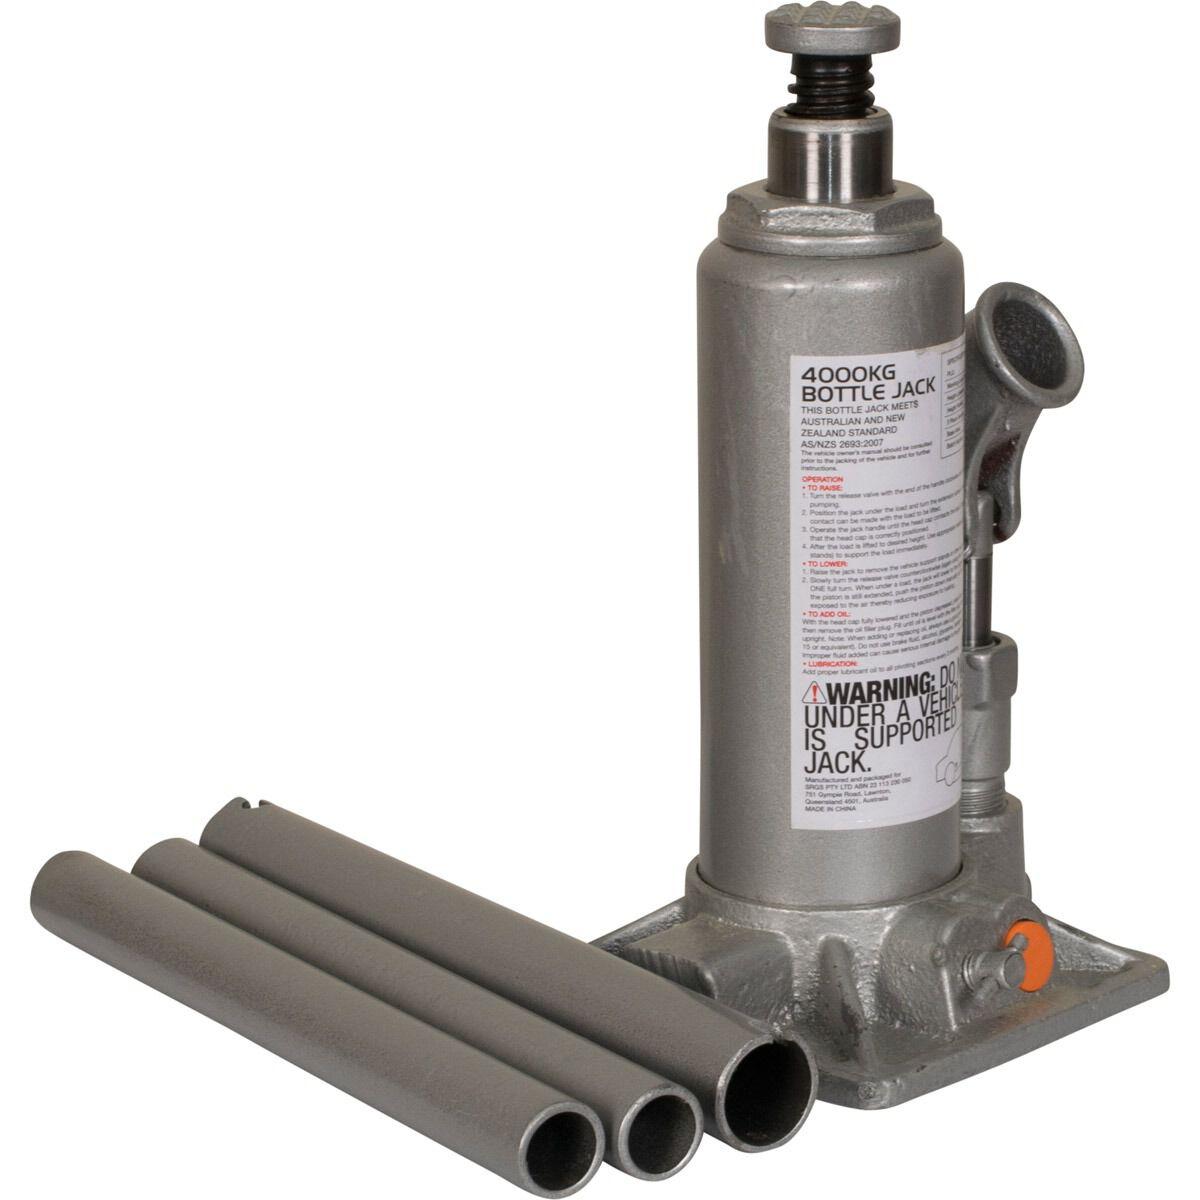 Hydraulic Bottle Jacks 6 Tonne 6T Bottle Jack Hydraulic Pump Hydraulic Gear Vehicle Car Tire Change DIY